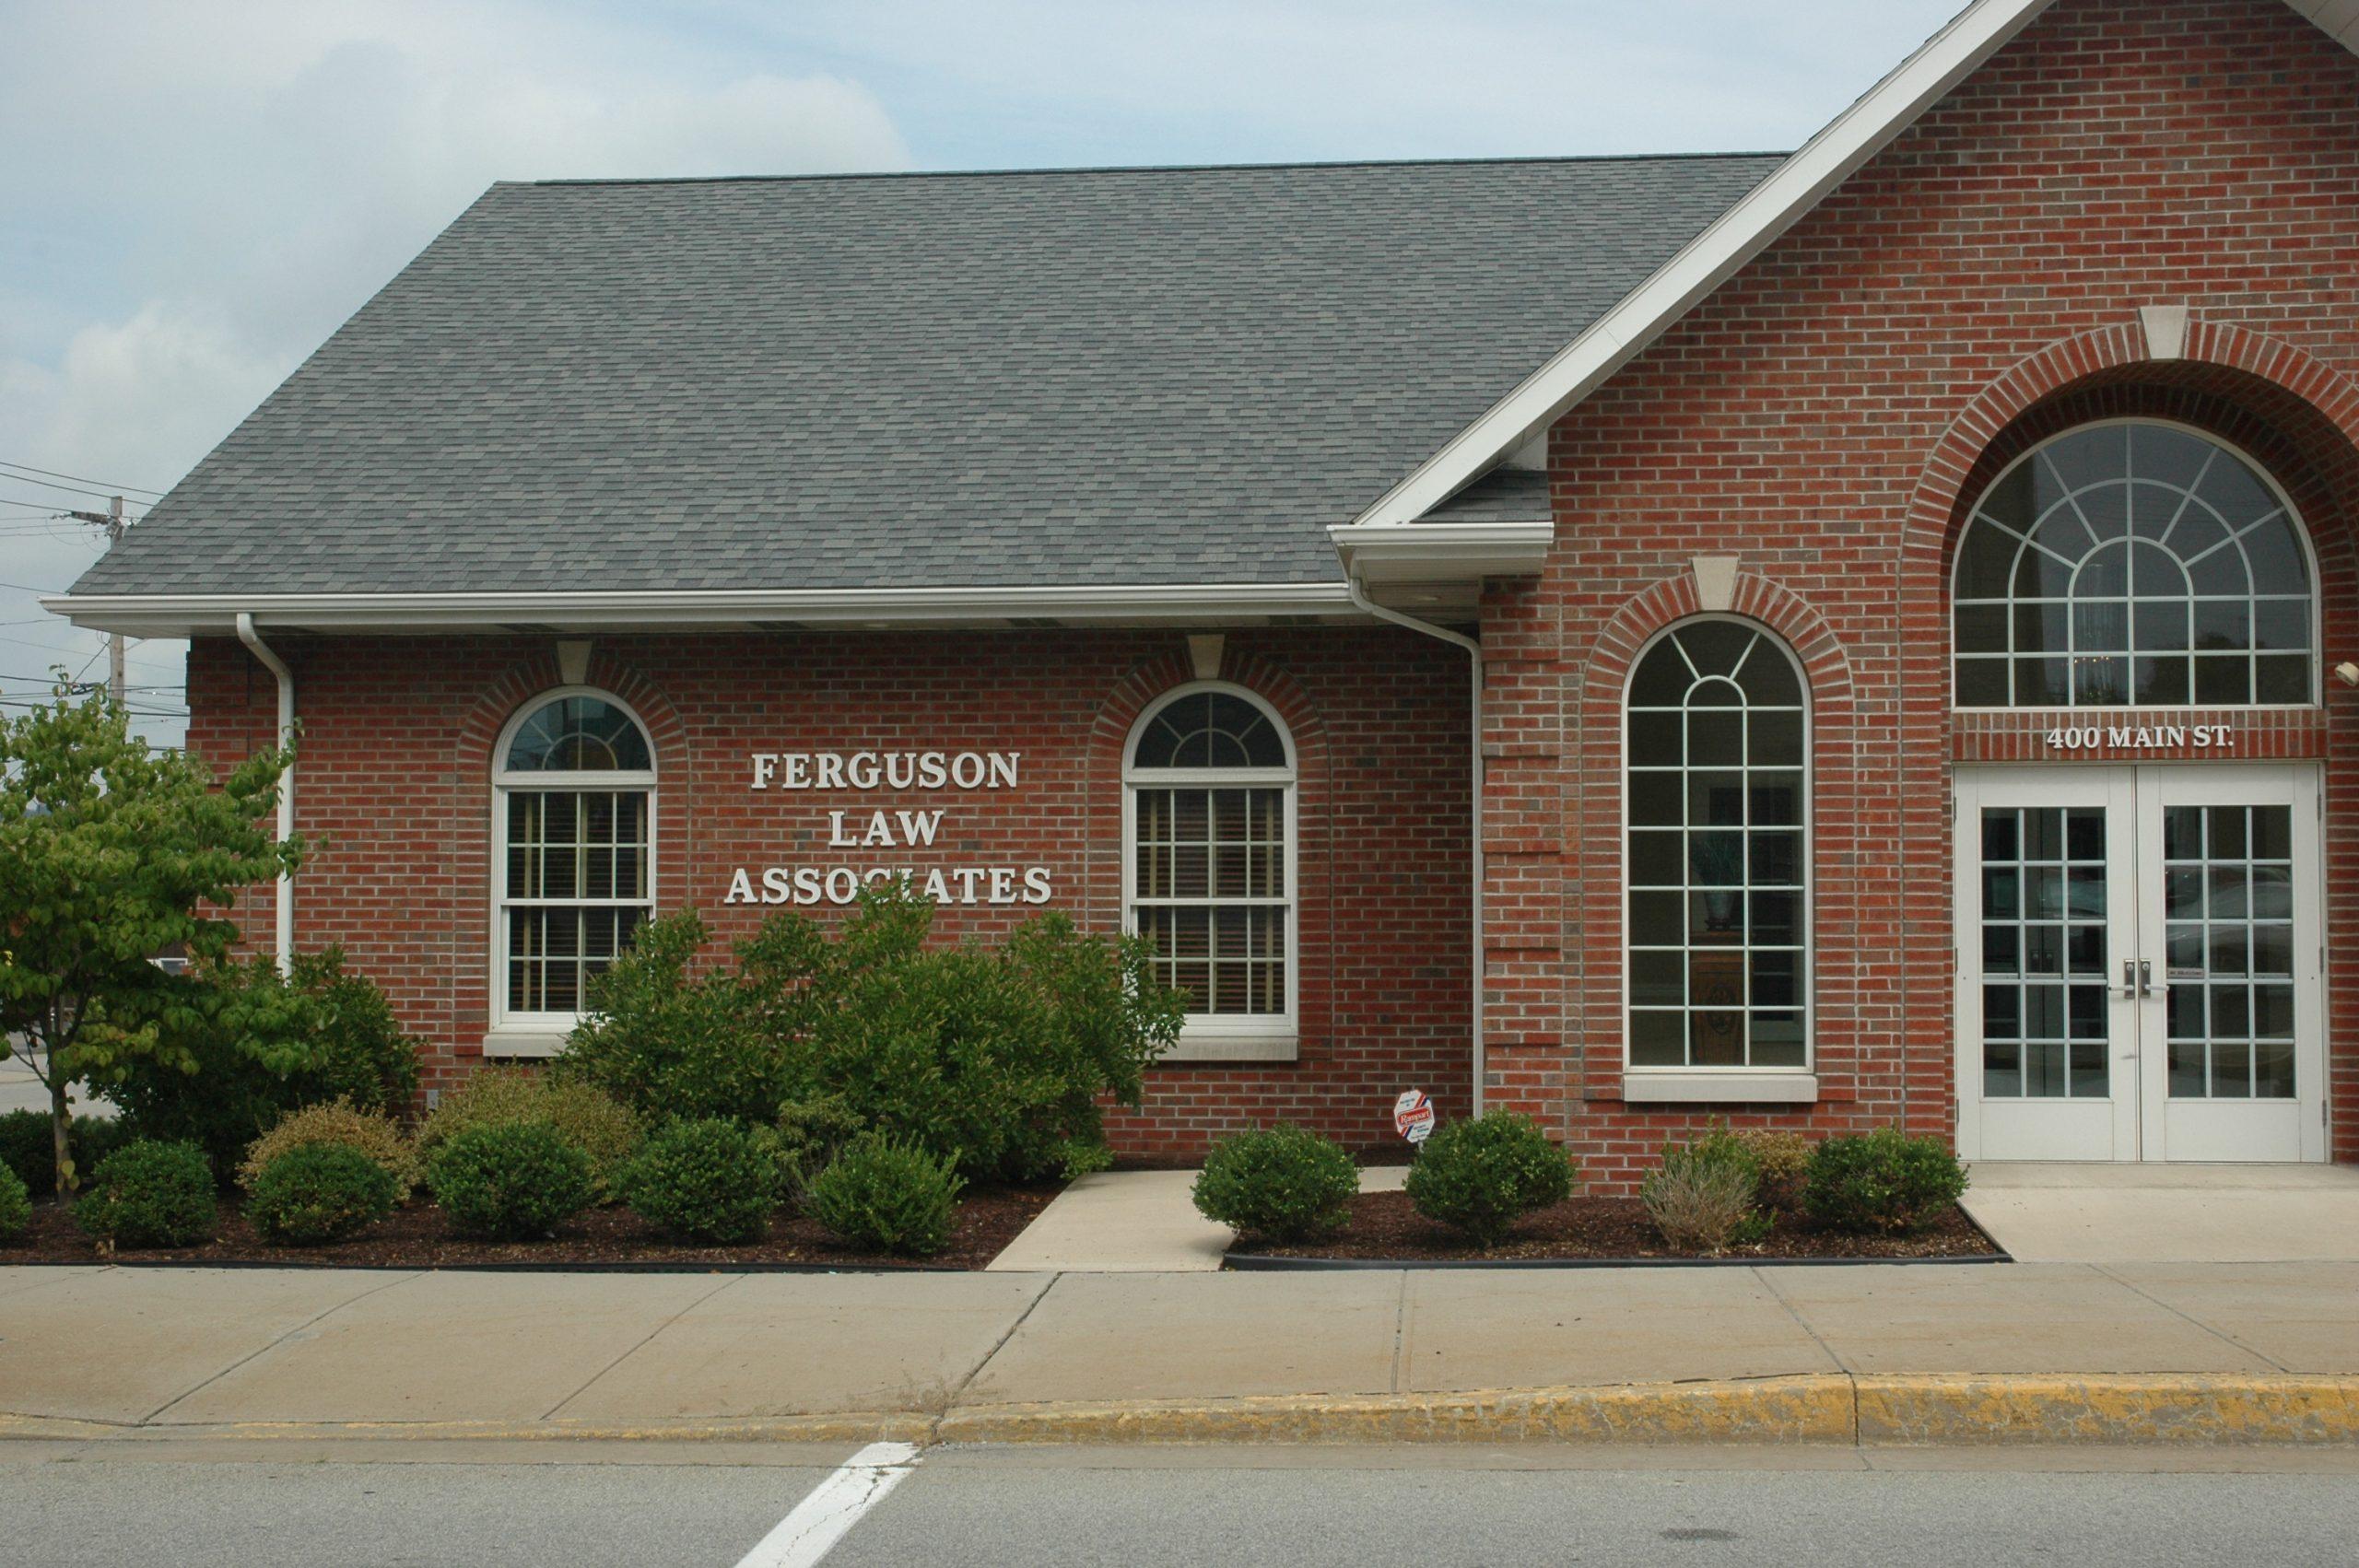 About Ferguson Law